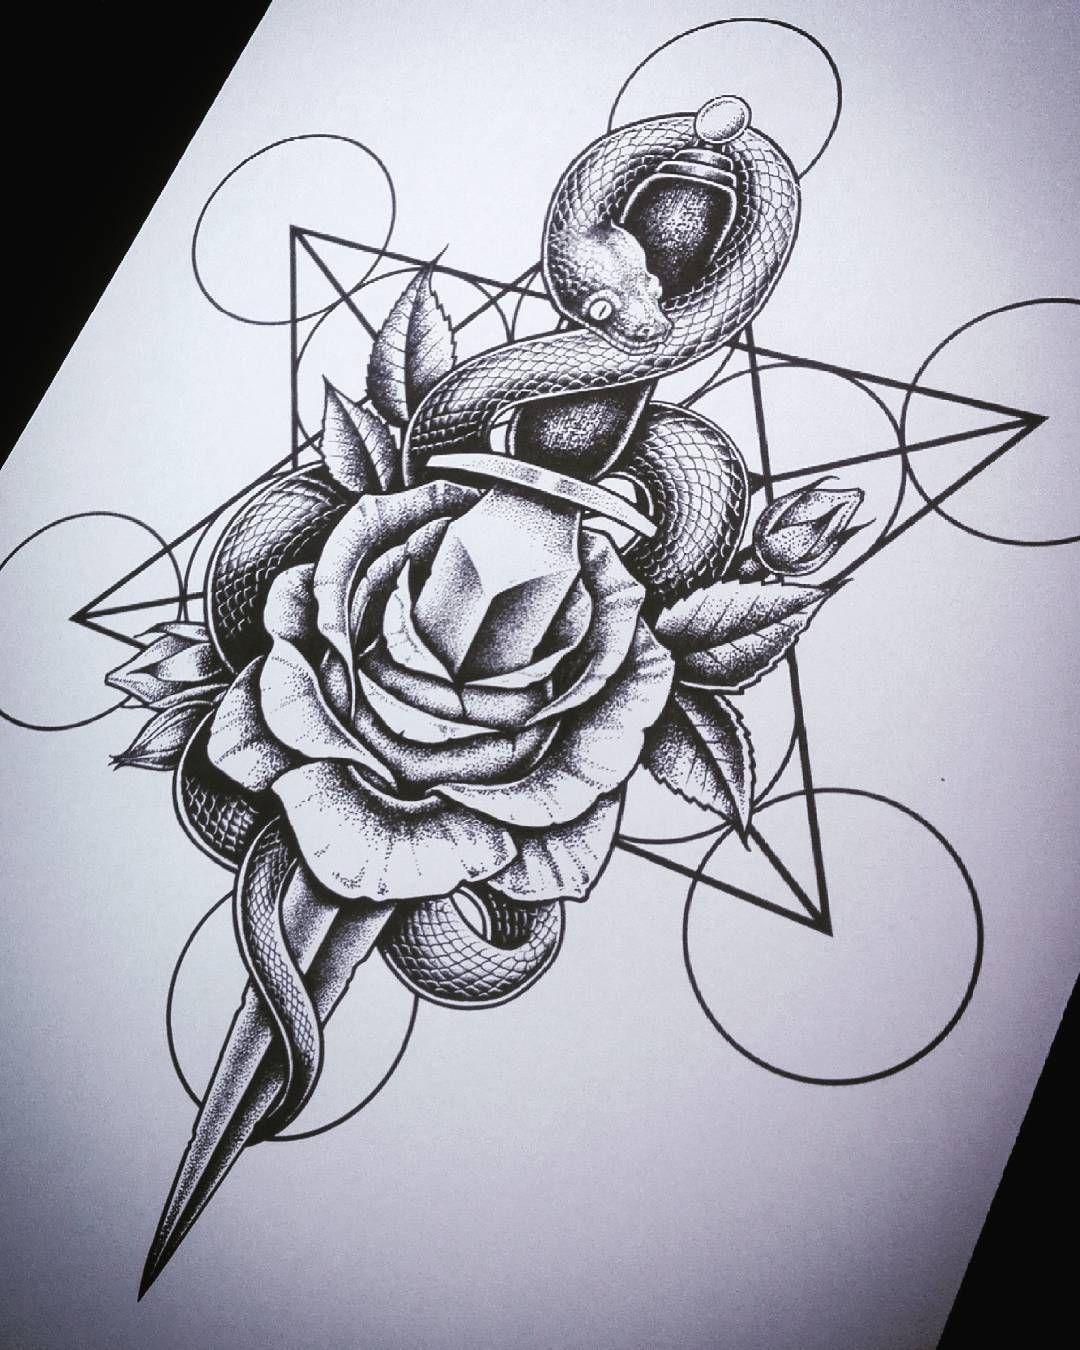 laurazuffotttsnake illustration drawing draw blackink